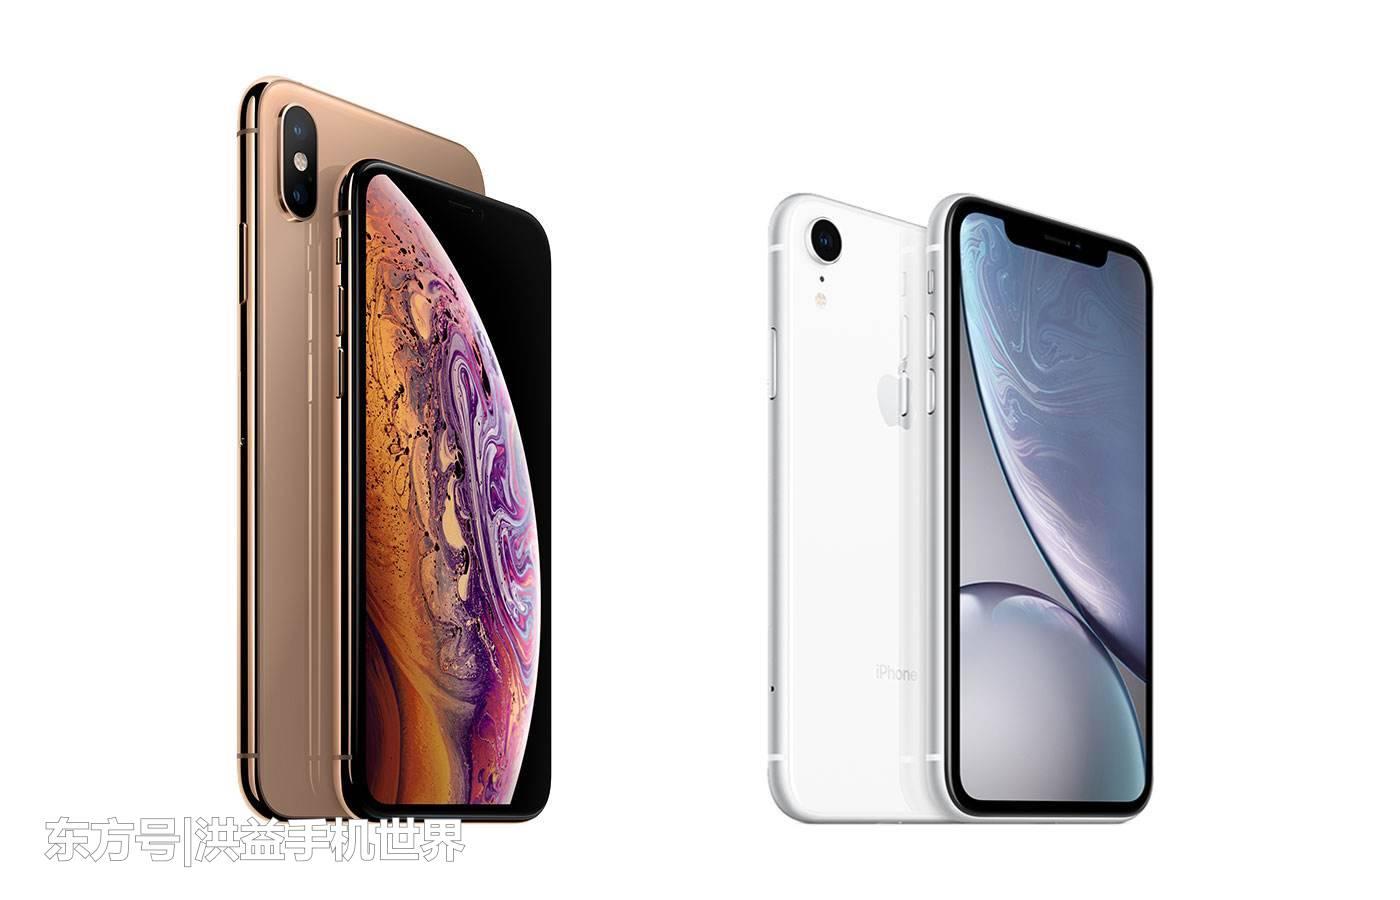 iphone 11 系列智能手机最新报价列表